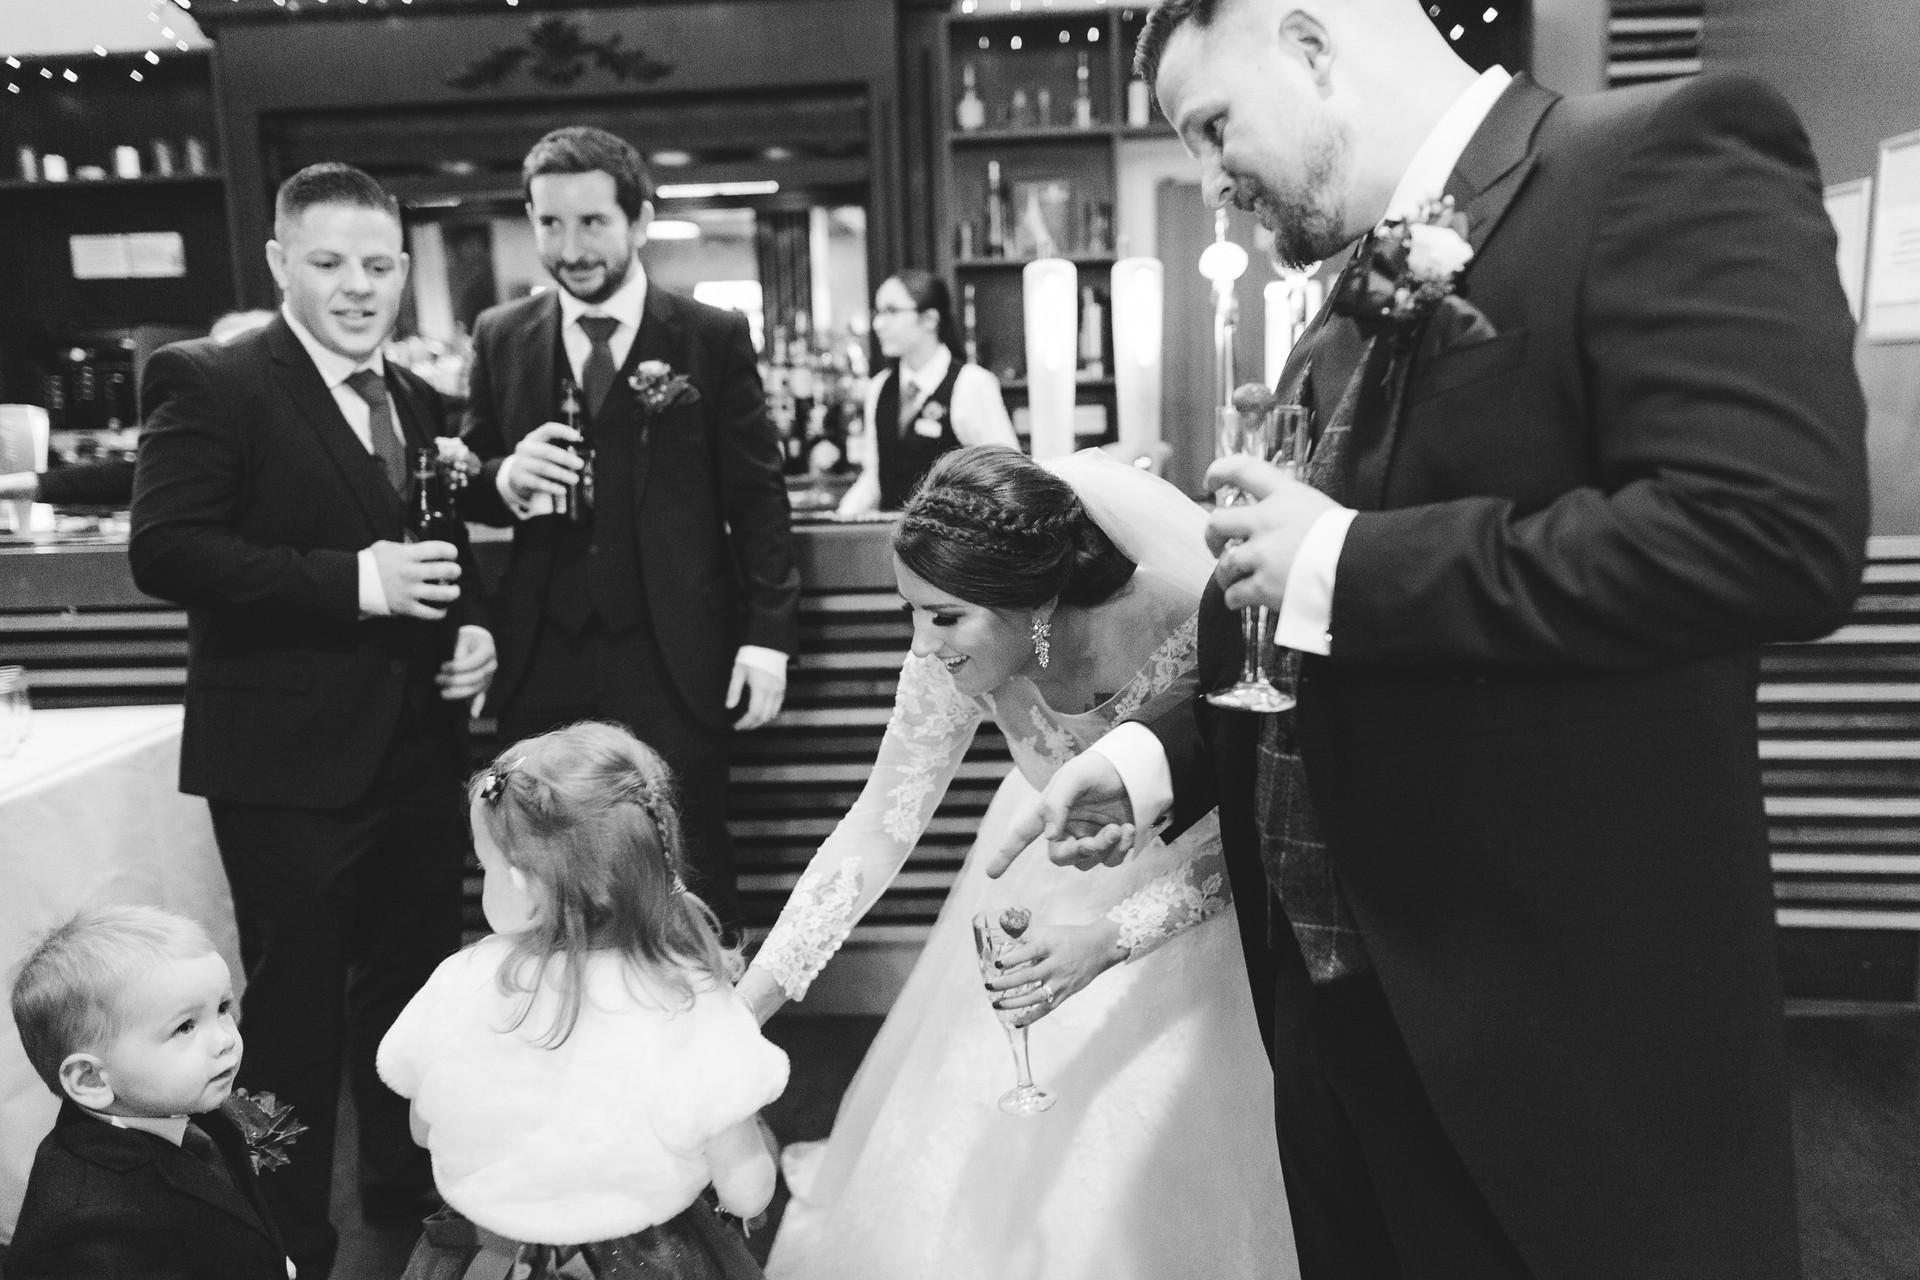 ilkley-west-yorkshire-wedding-133.jpg